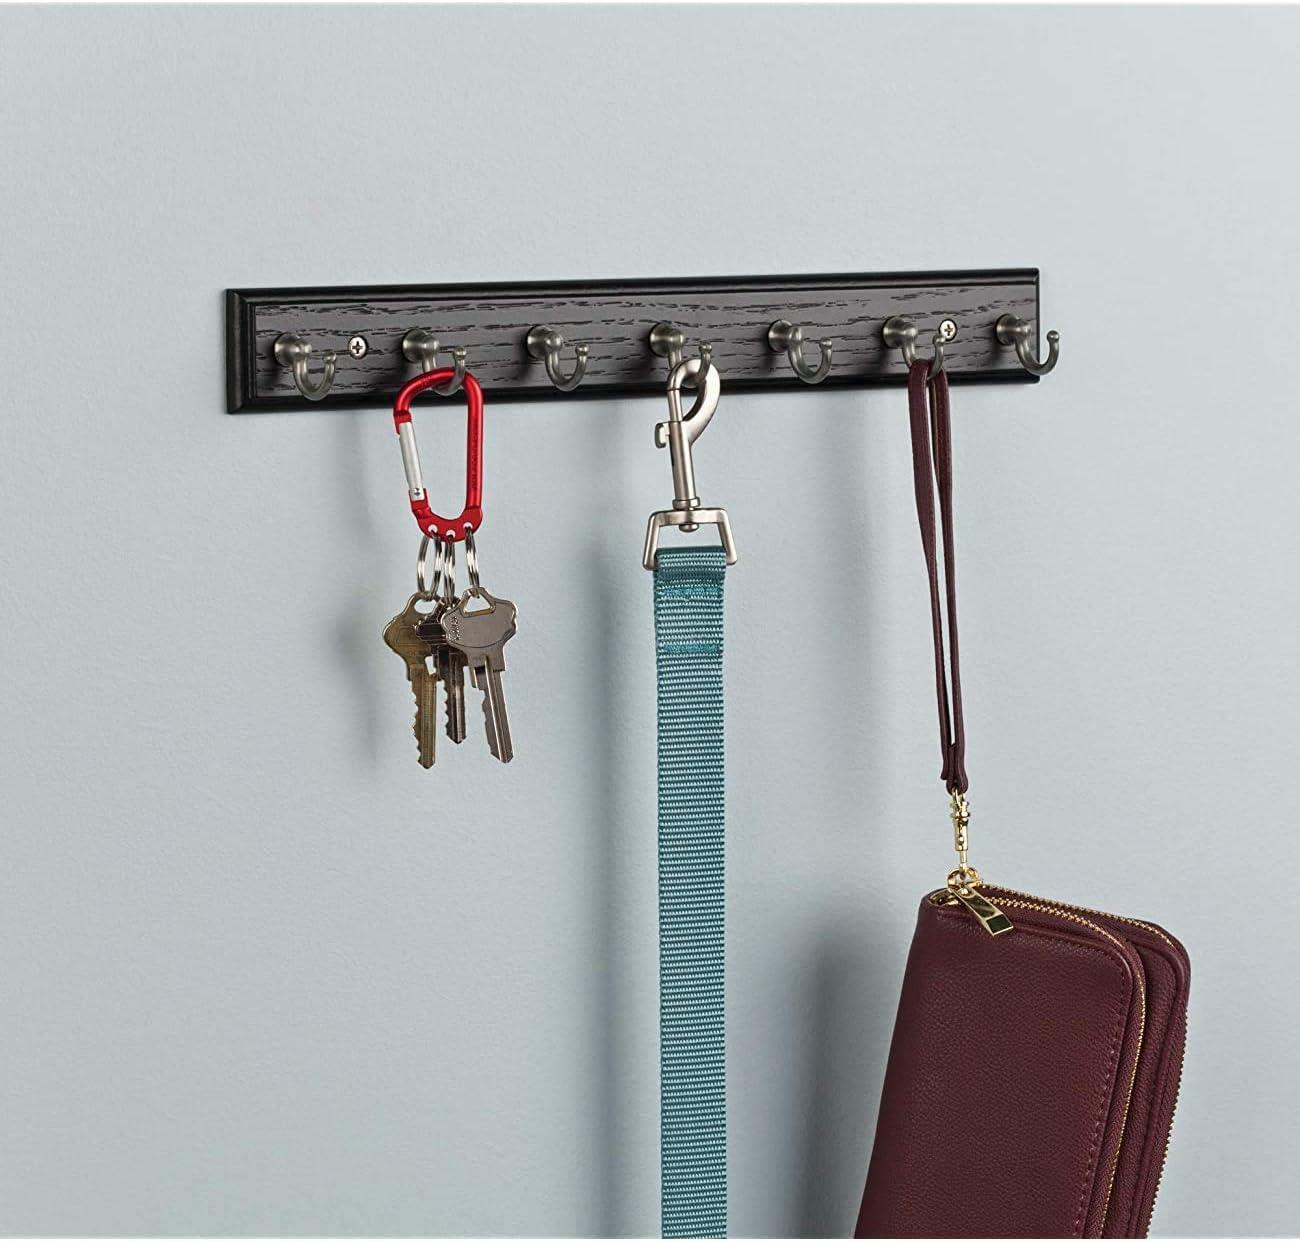 14-inch Rack Key Rail with 7 Hooks Black /& Satin Nickel